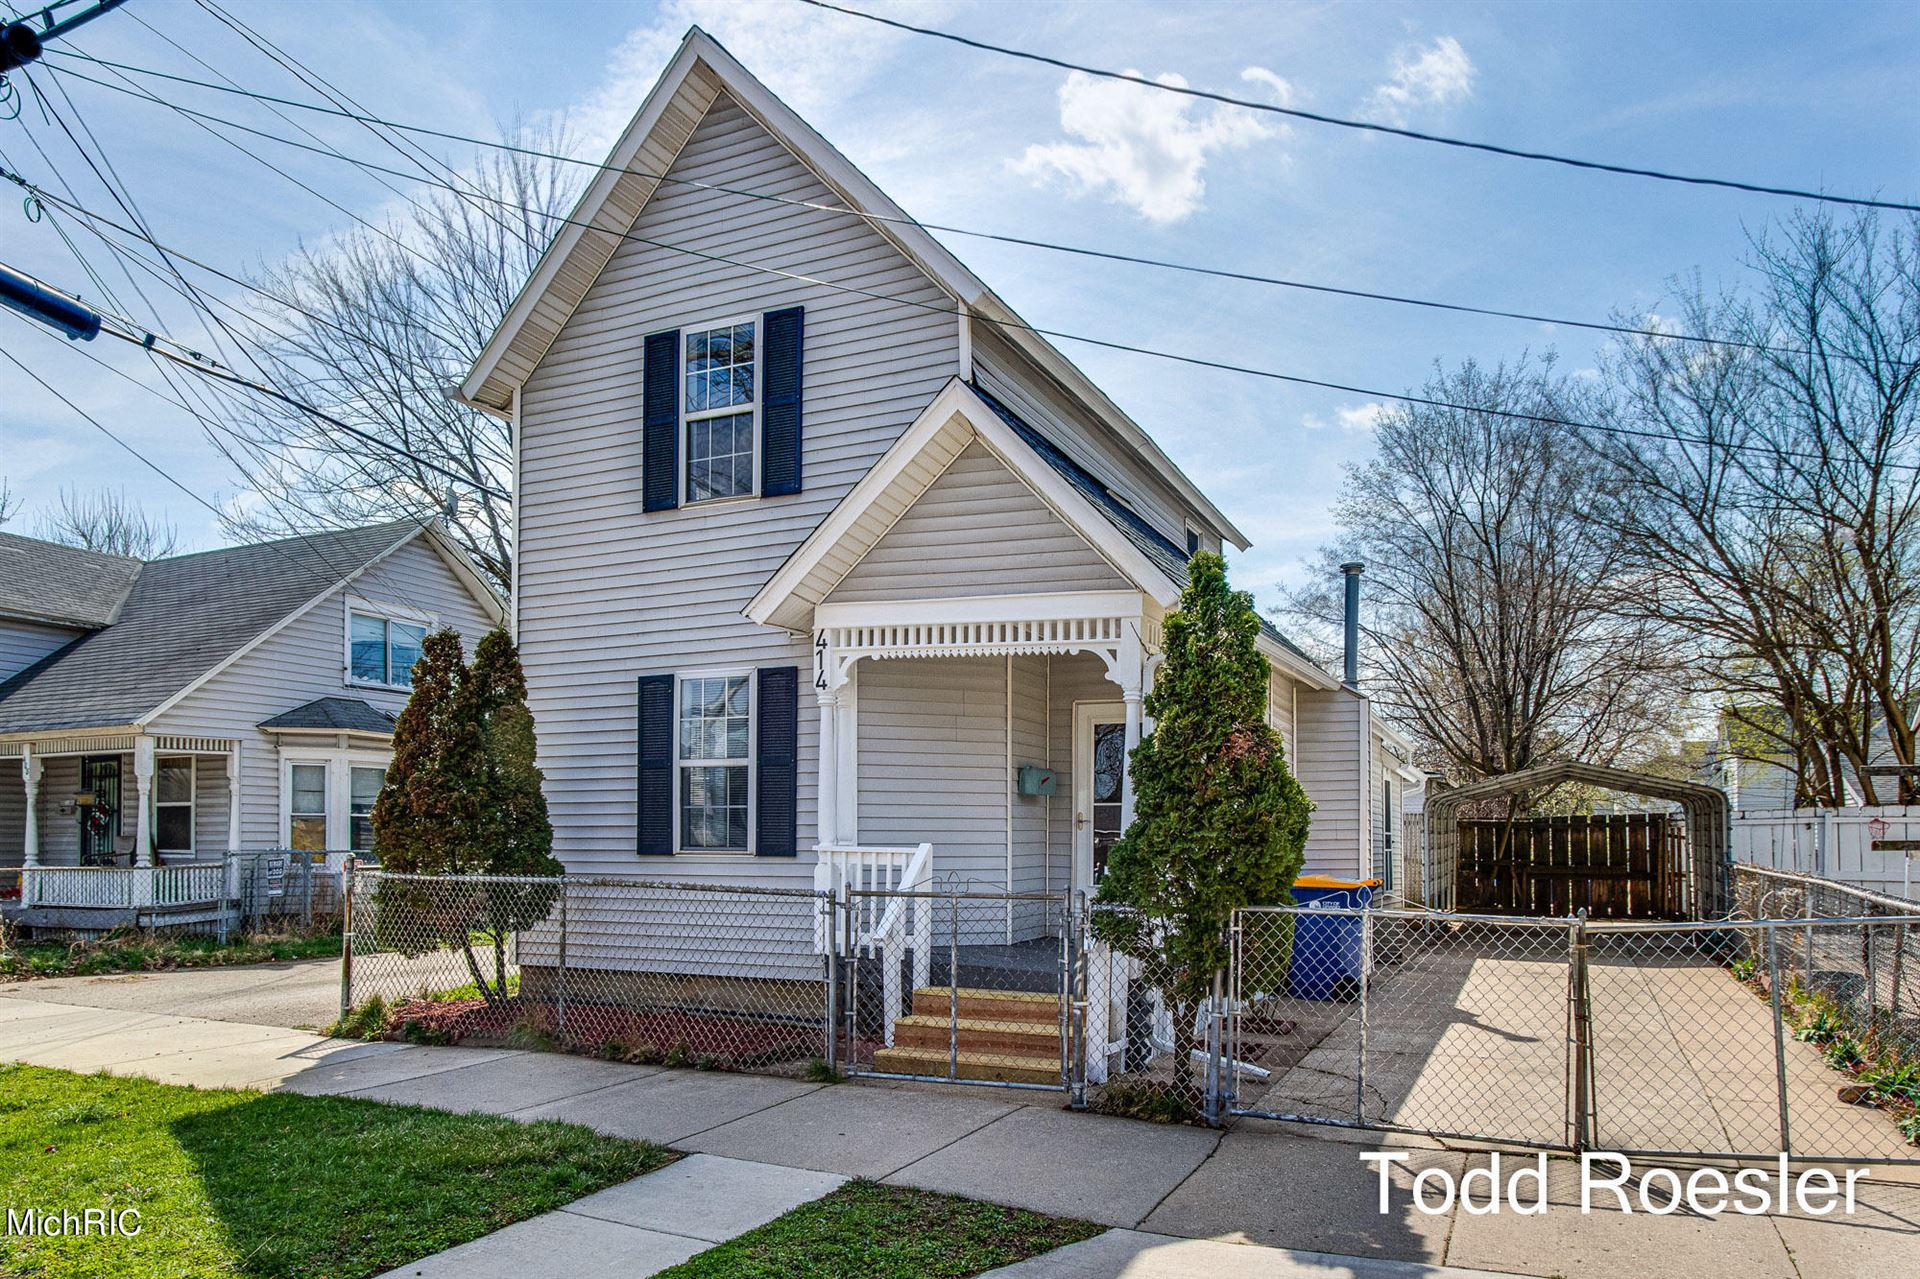 414 Myrtle Street NW, Grand Rapids, MI 49504 - MLS#: 21011440